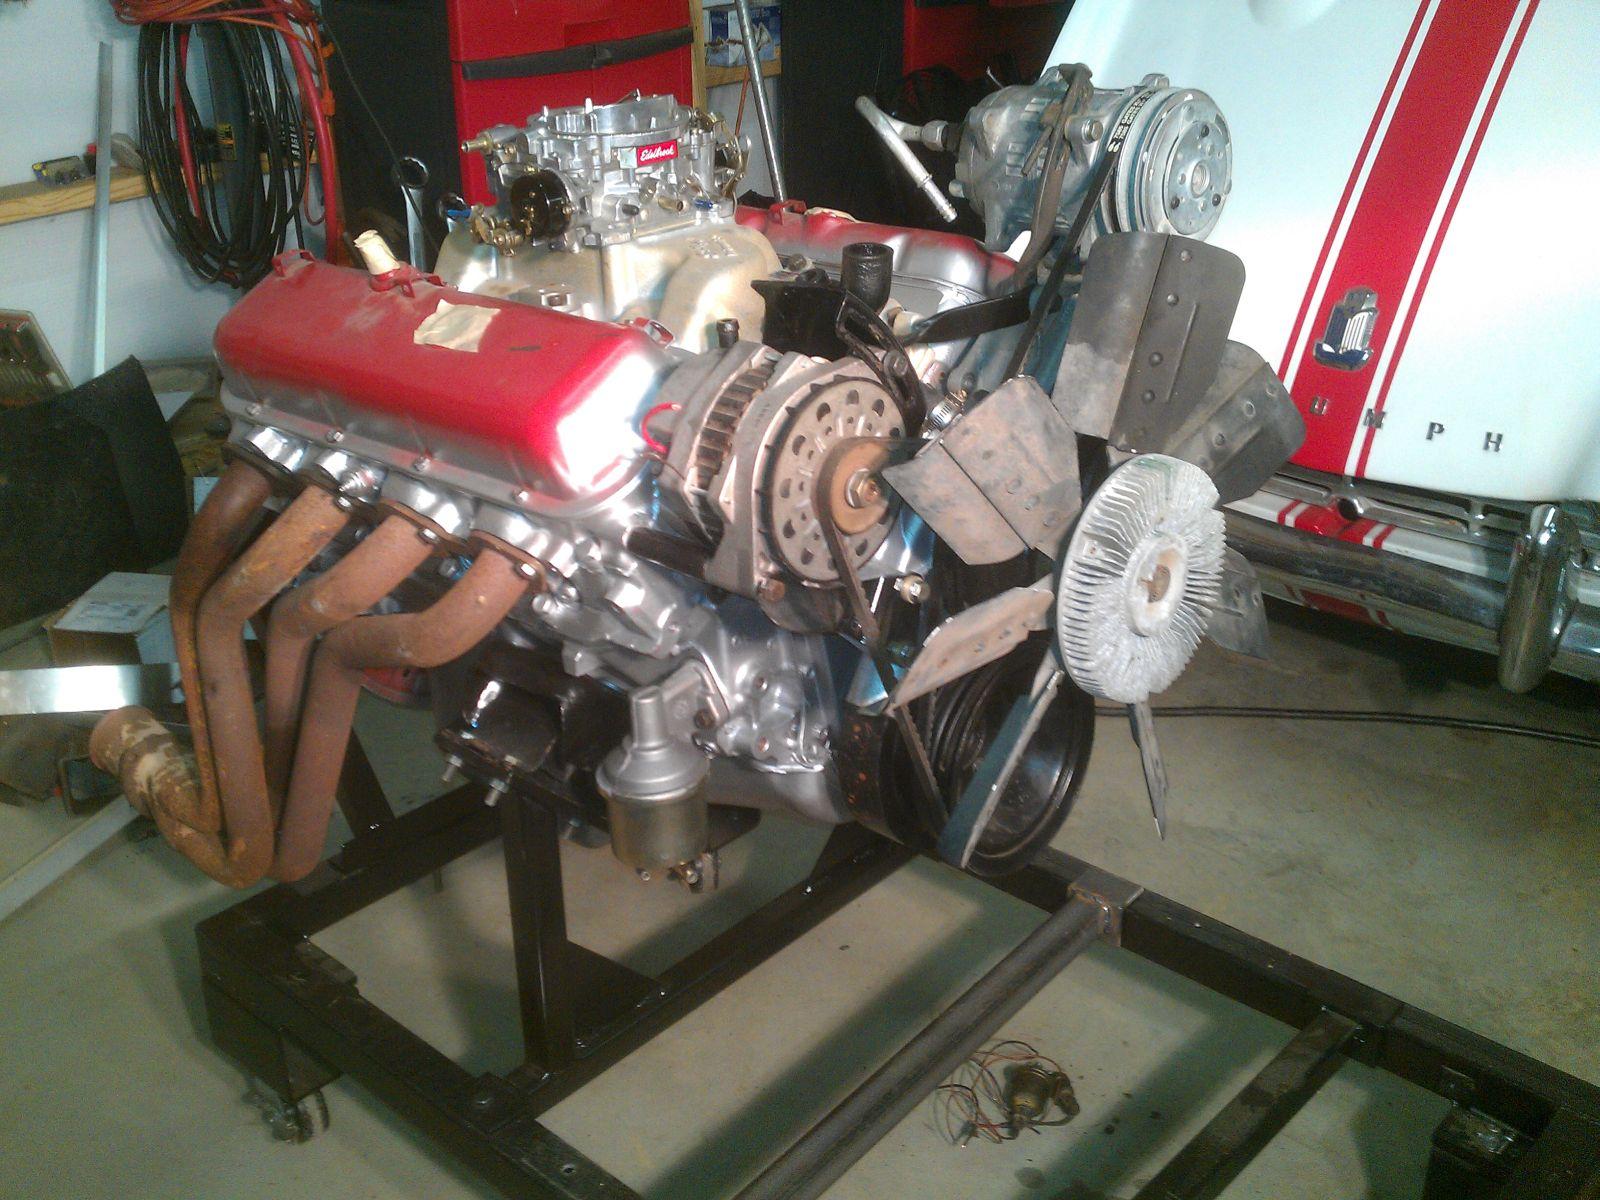 Click image for larger version  Name:74-argosy-engine-side-ac-alt.jpg Views:90 Size:329.9 KB ID:178178